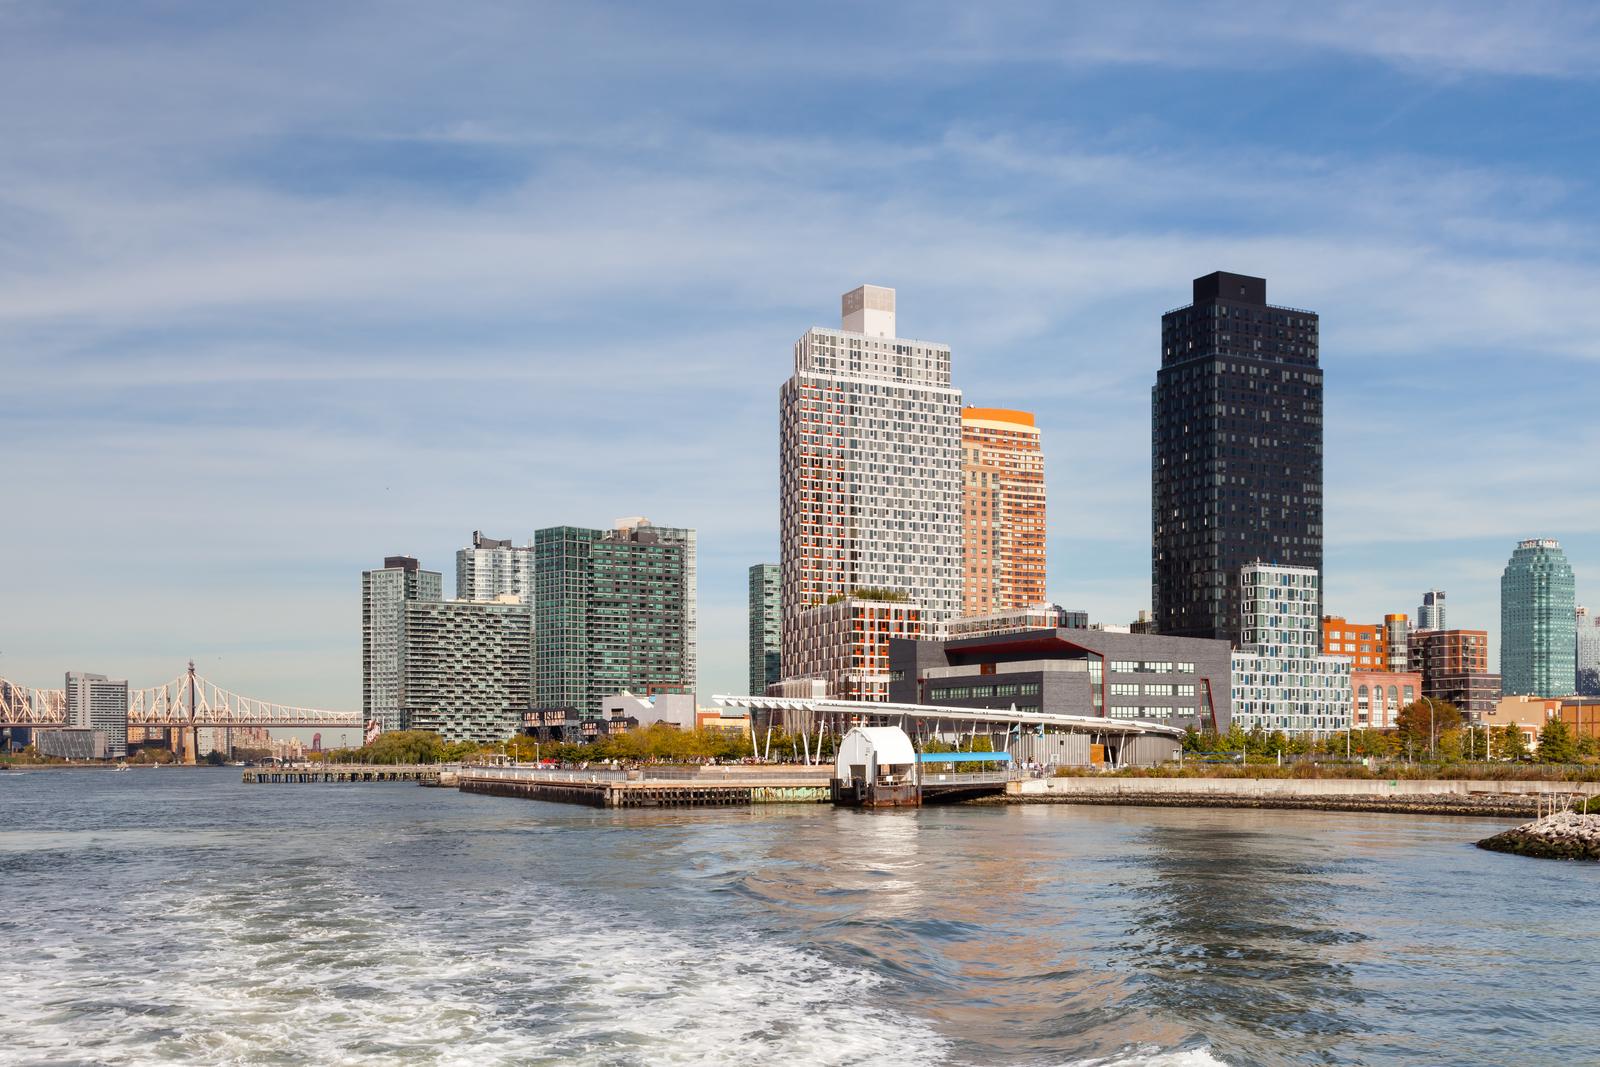 Queens West Queens, NY Private Investigator